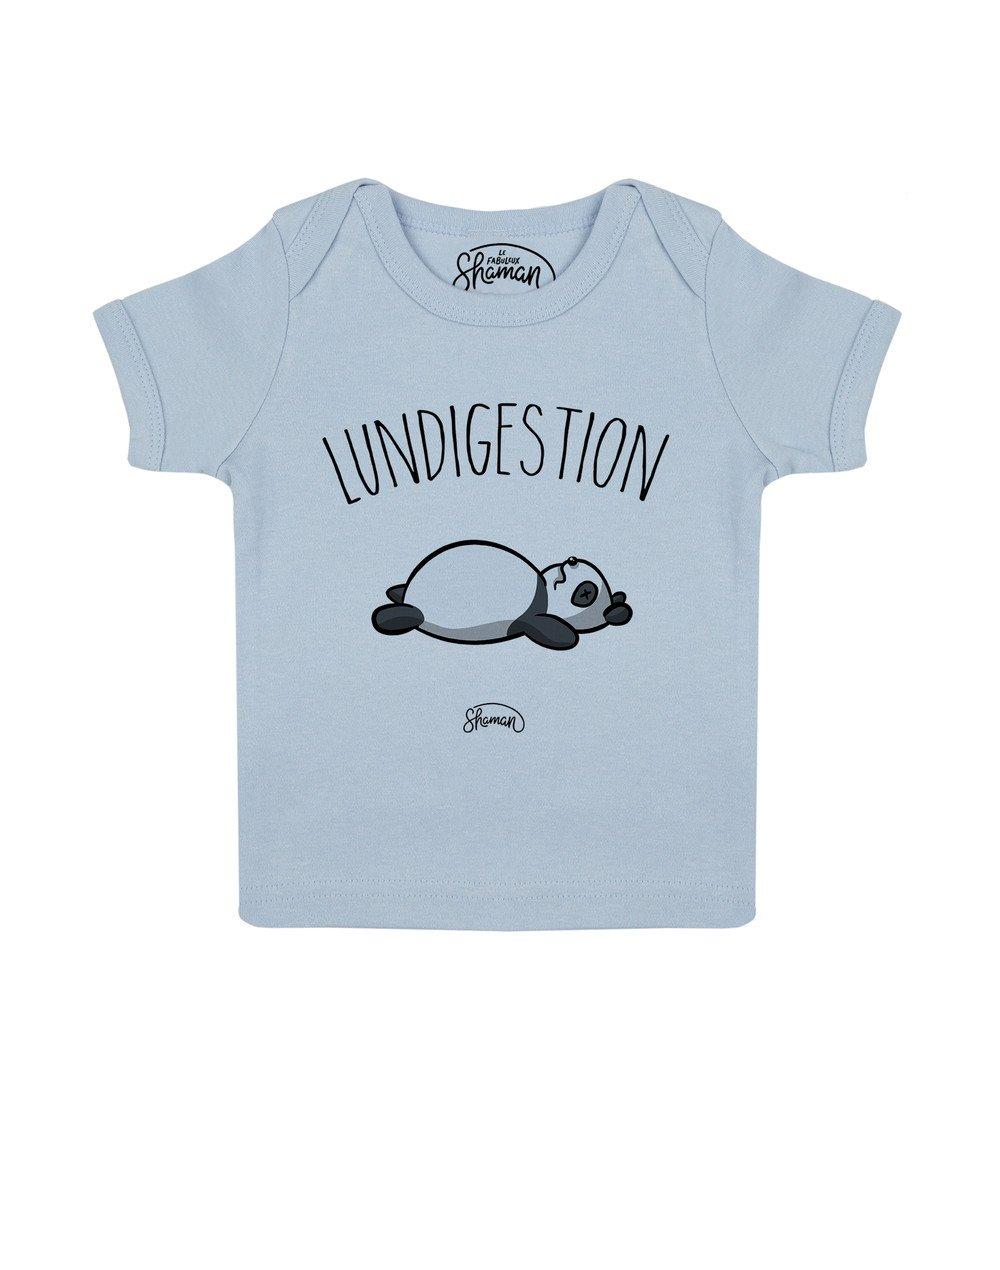 Tee shirt Lundigestion